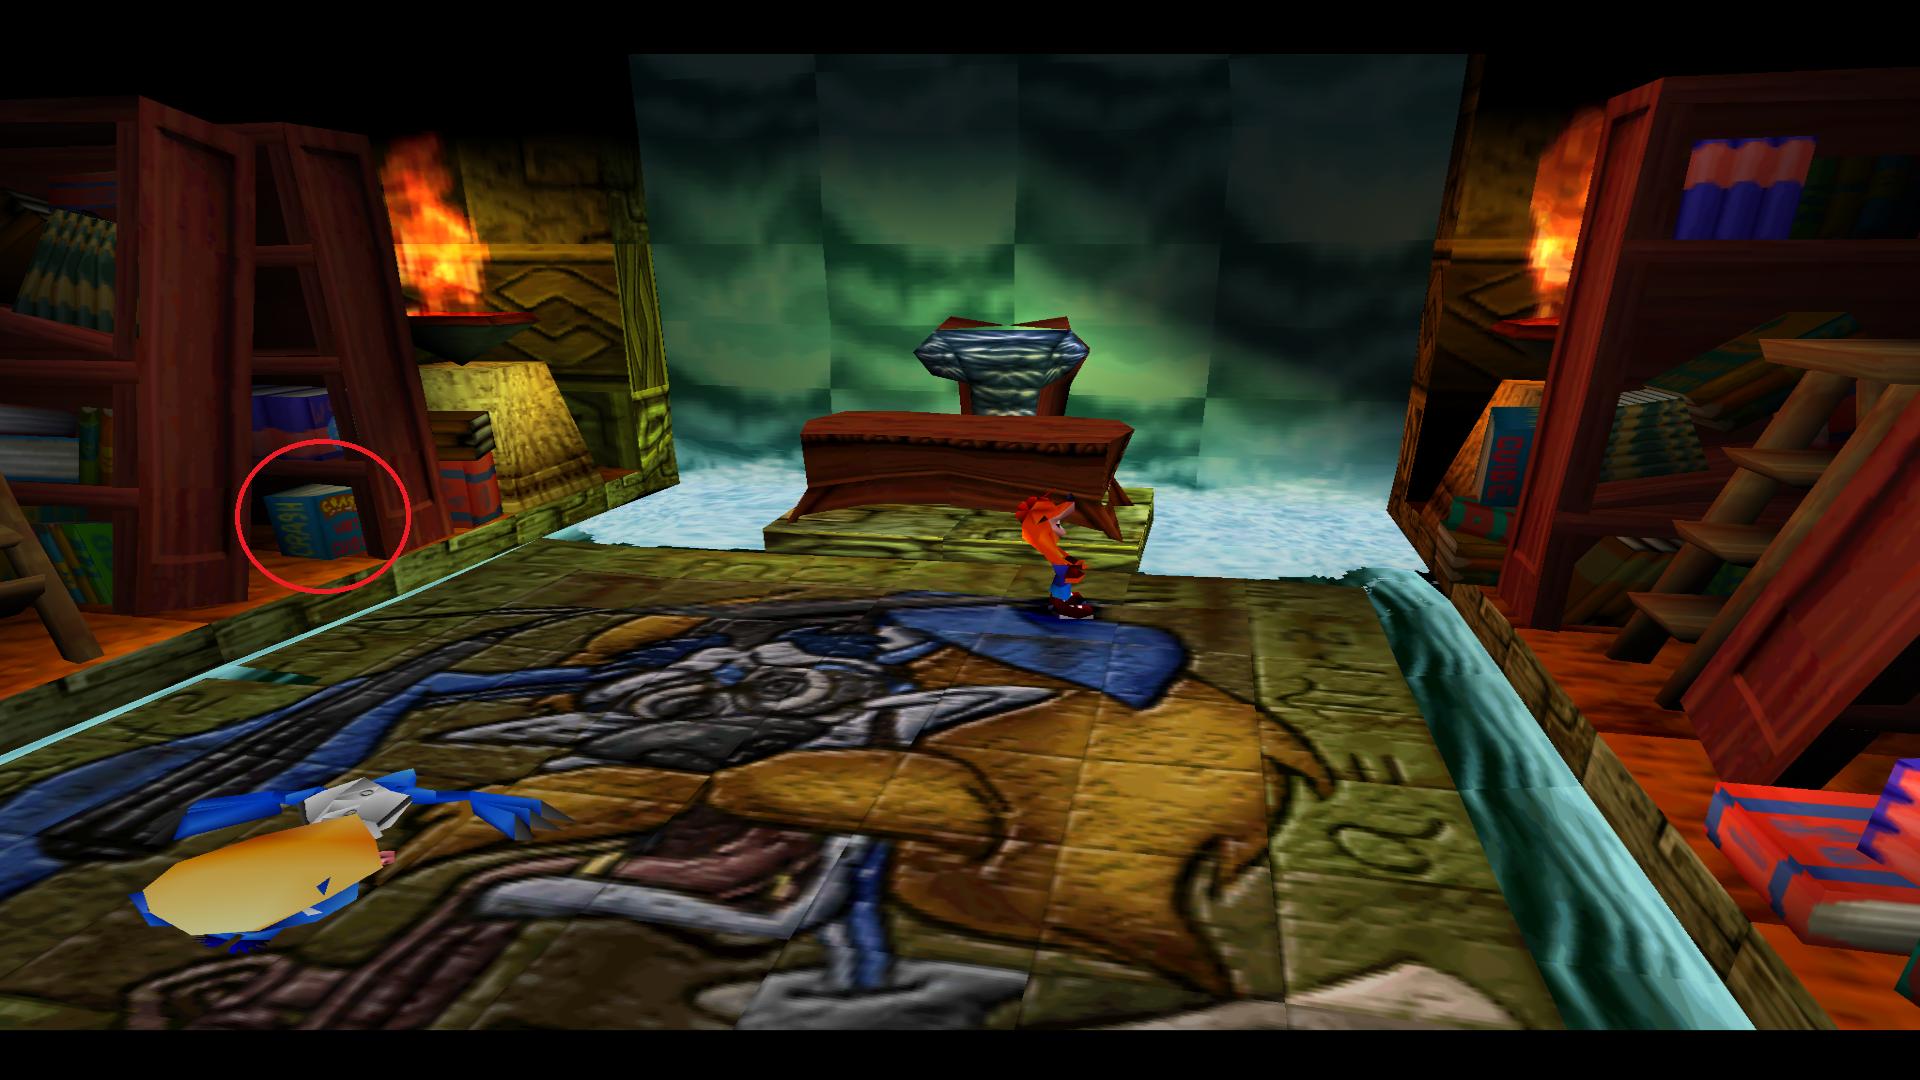 Crash Bandicoot 2 Cortex Strikes Back Game View